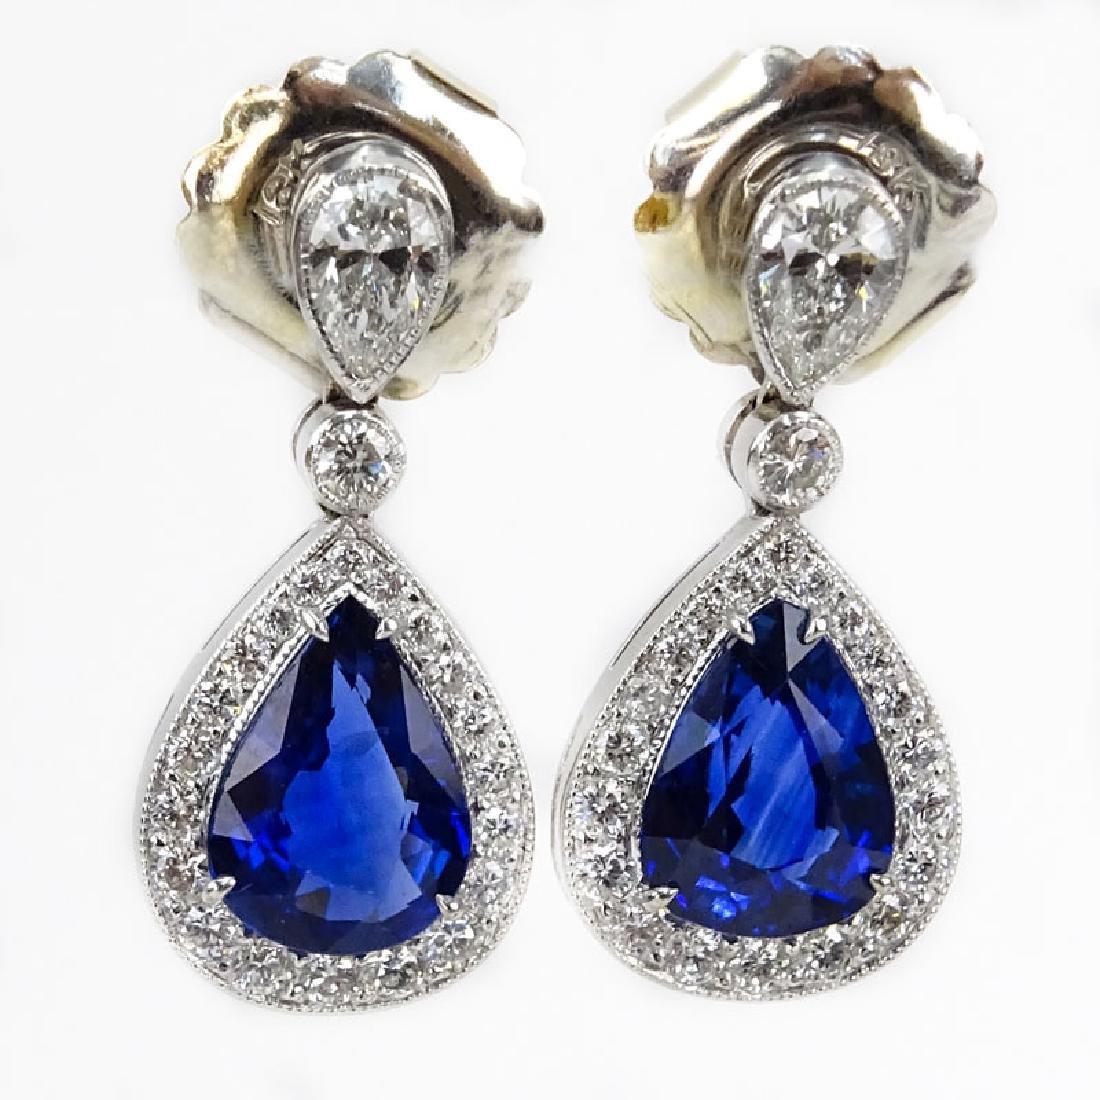 Vintage Approx. 5.40 Carat Pear Shape Sapphire, Diamond